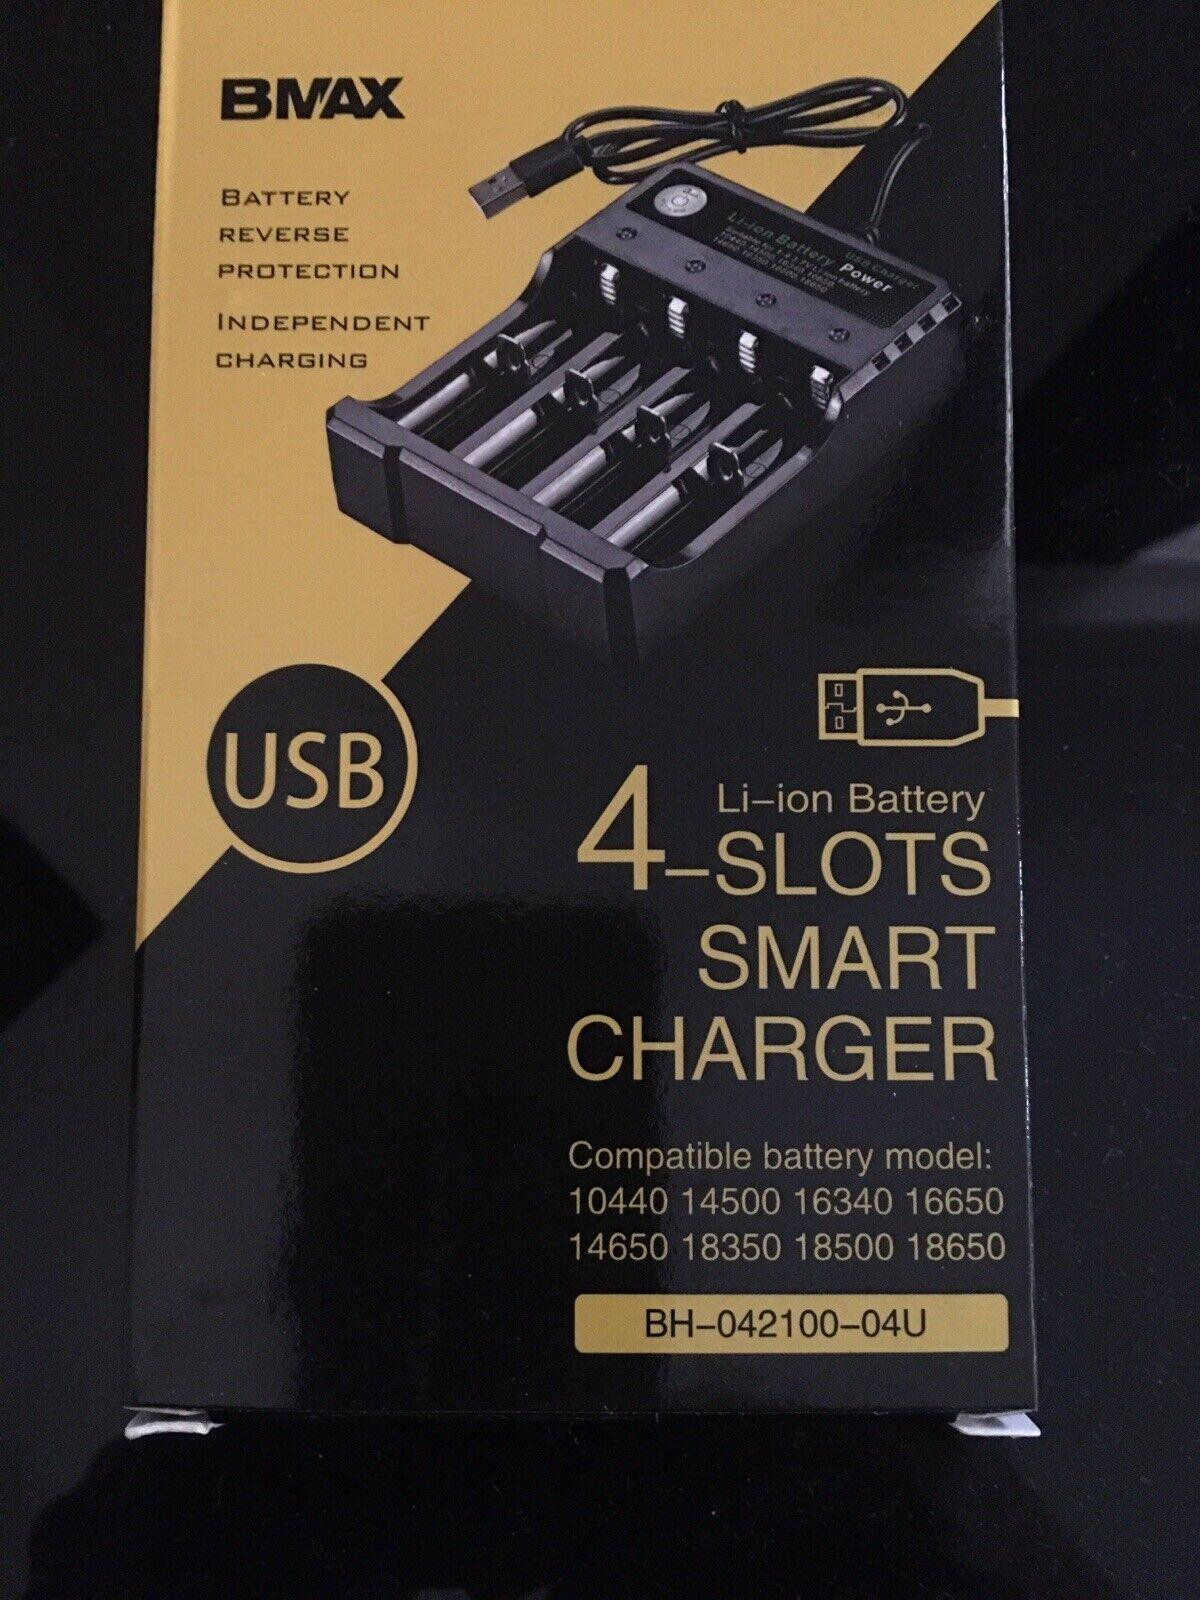 4 slots smart USB 18650 li-ion battery charger